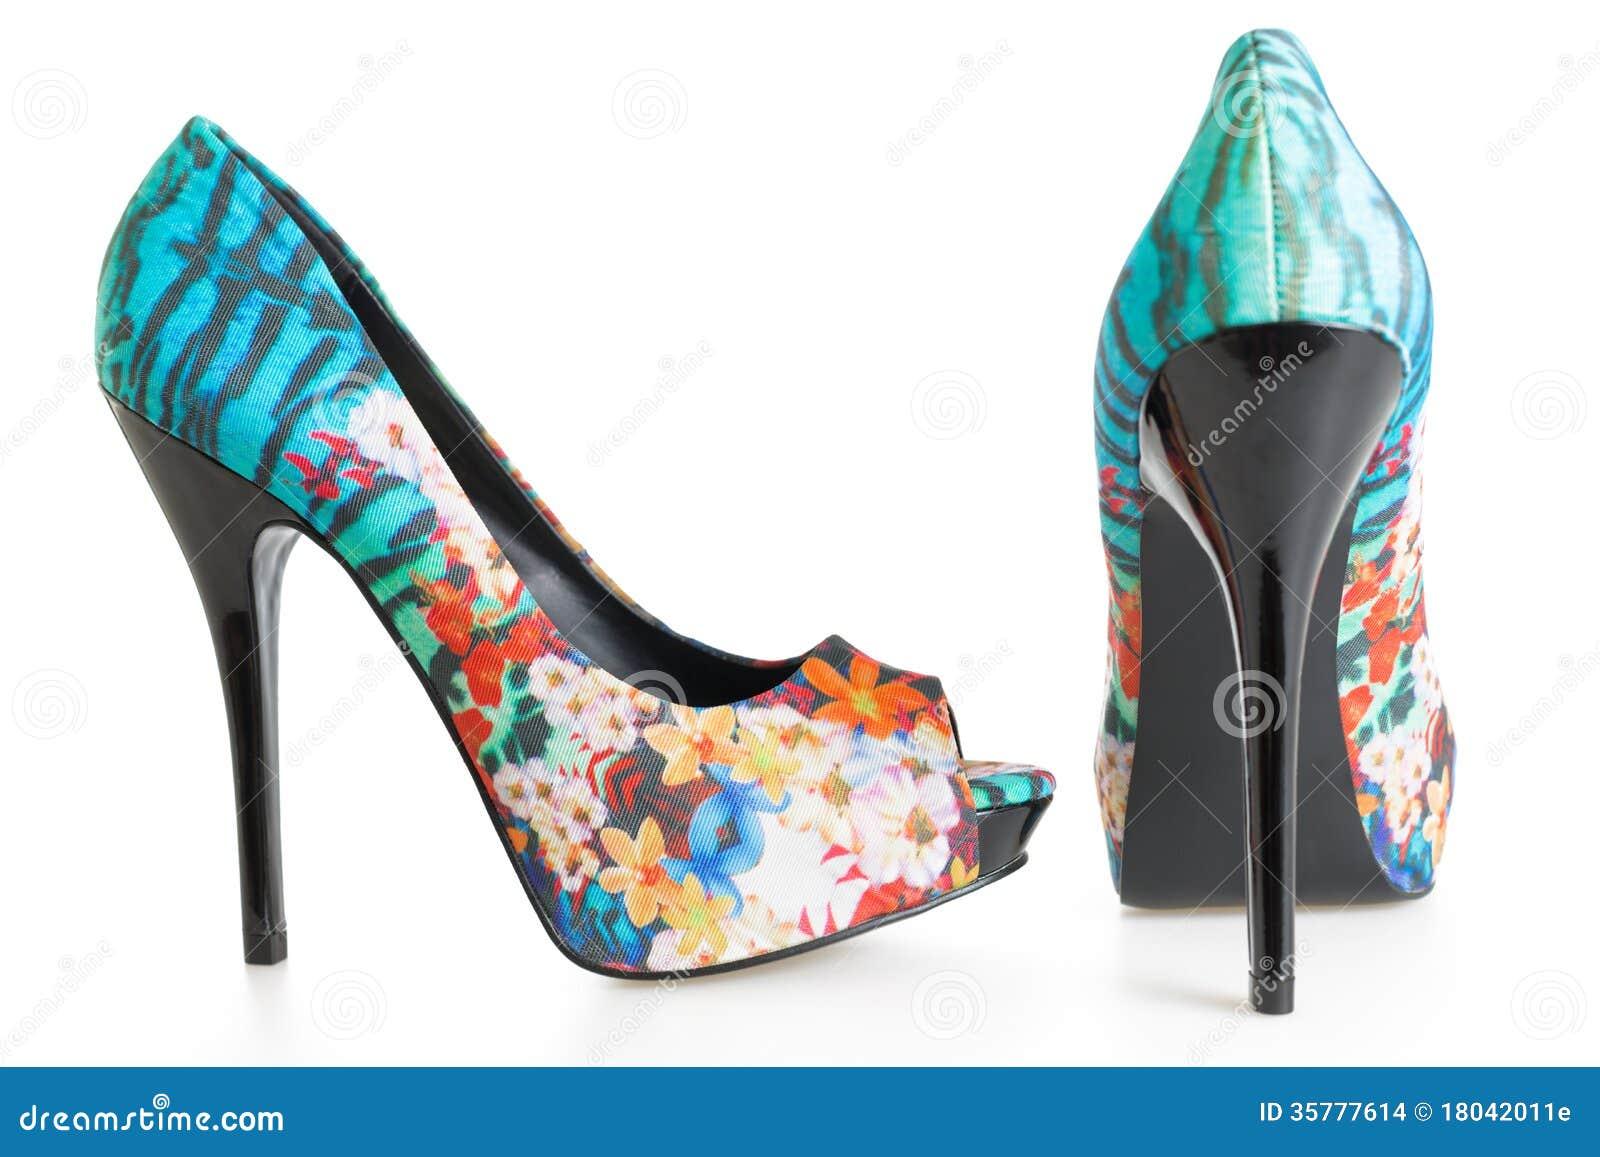 Stilettos - your-next-shoes Photo